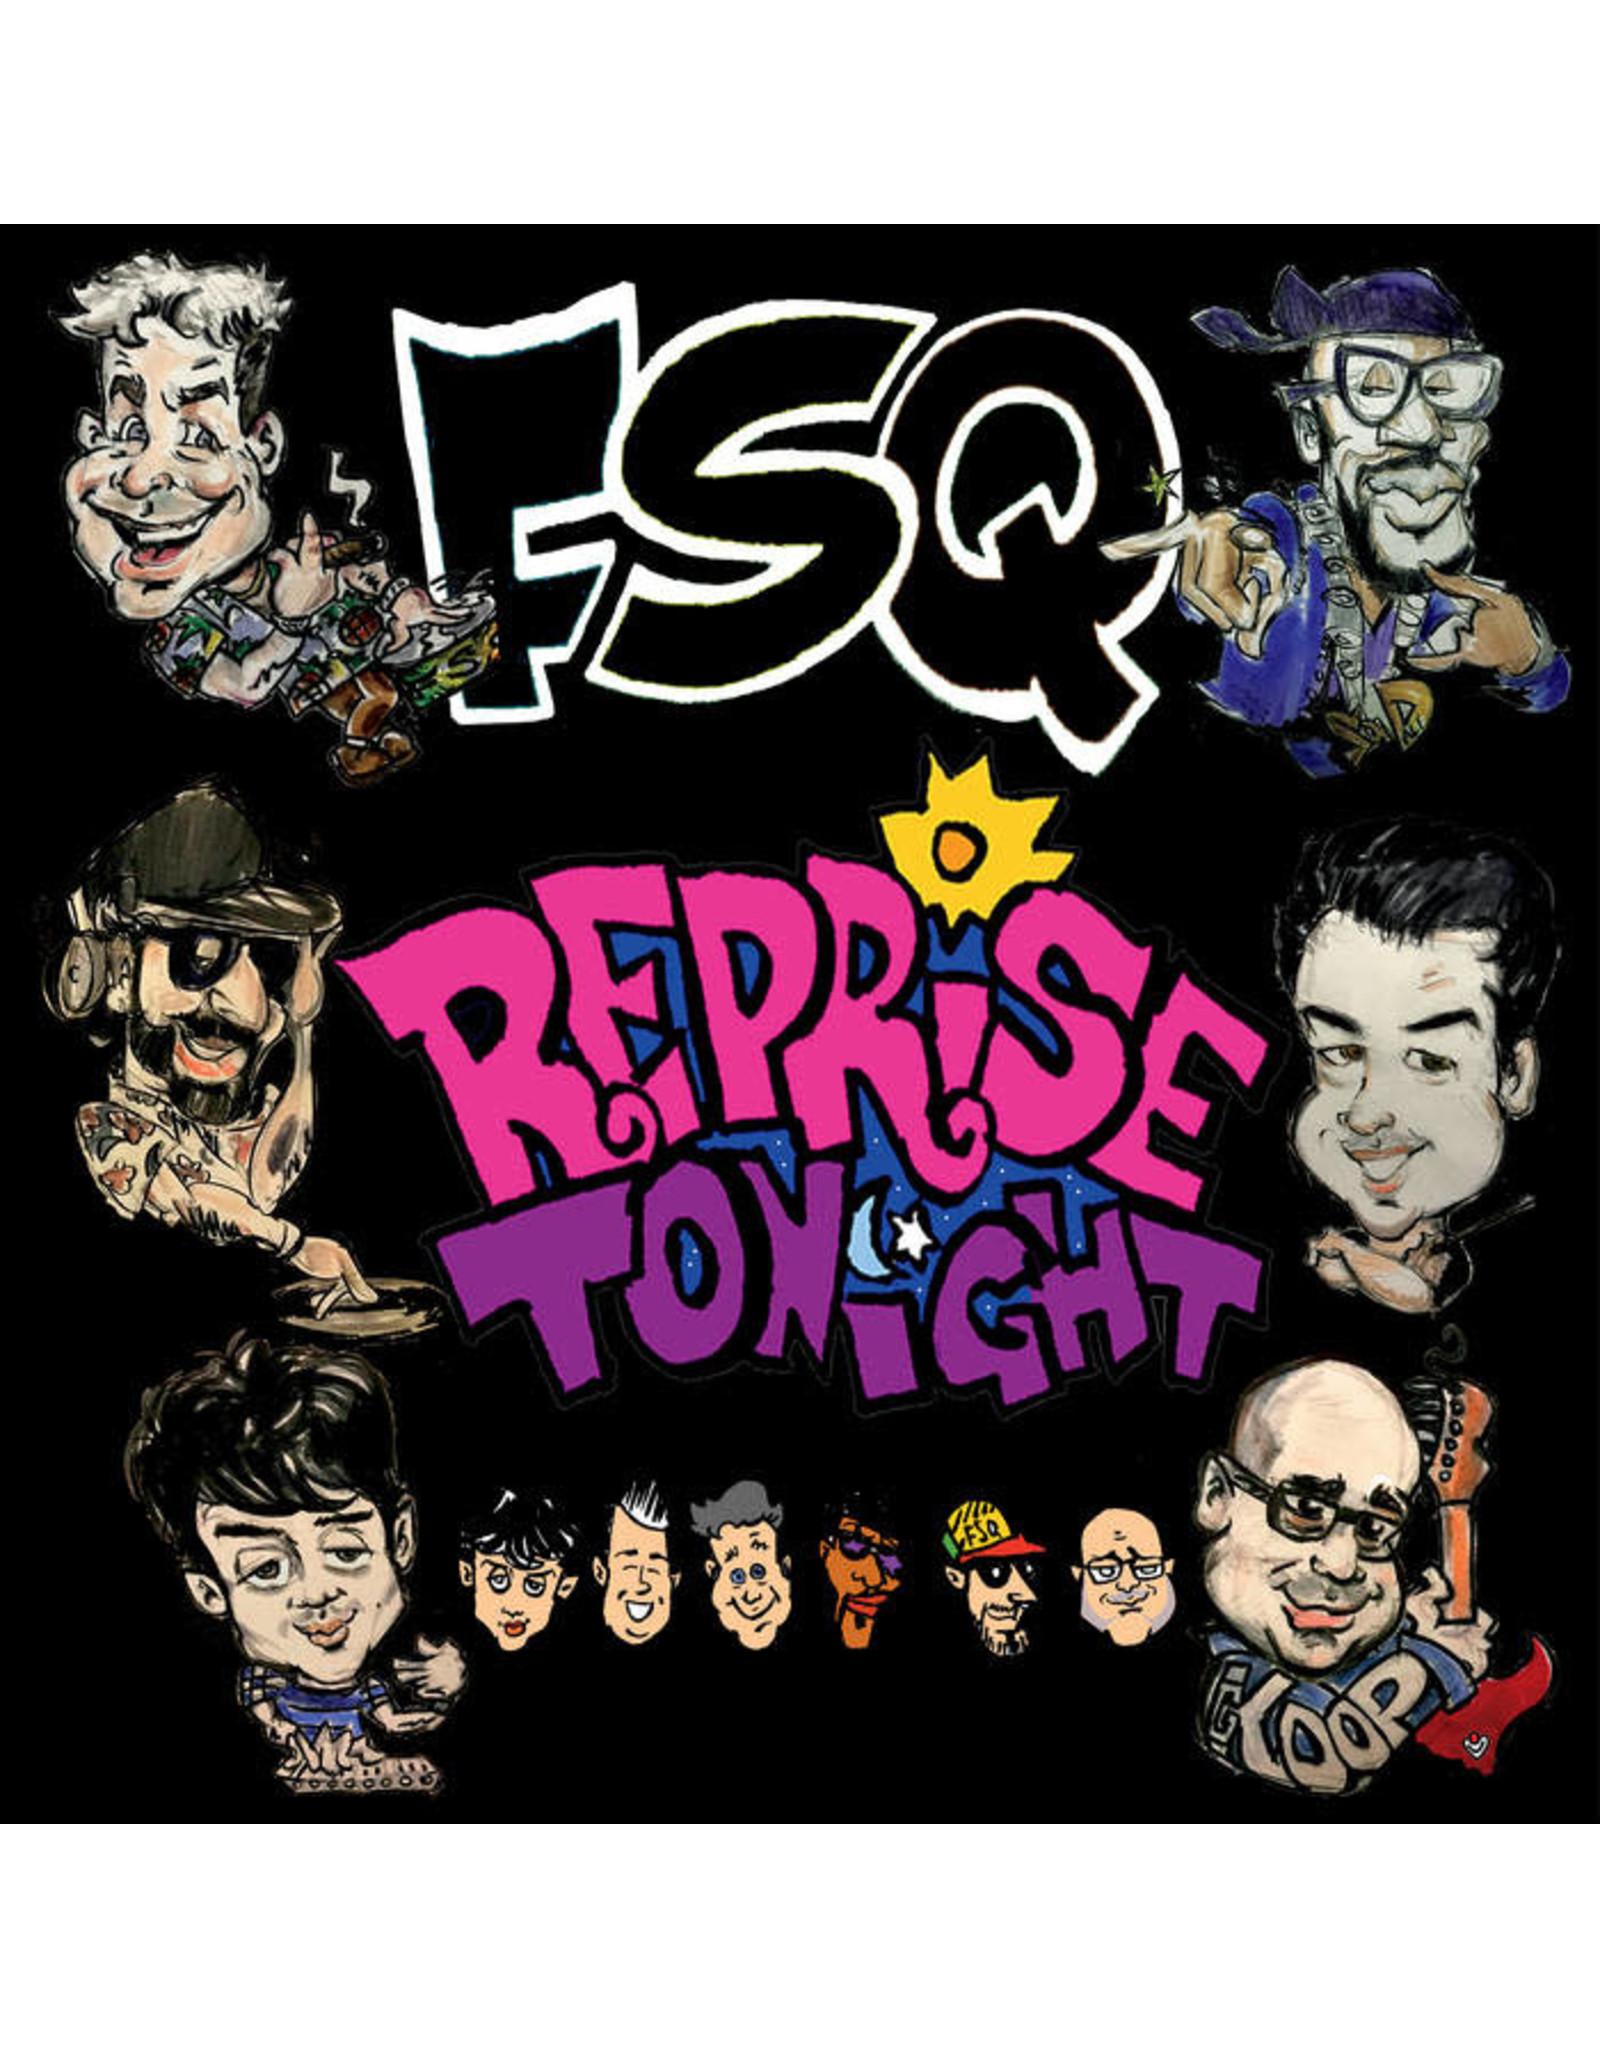 New Vinyl FSQ - Reprise Tonight LP